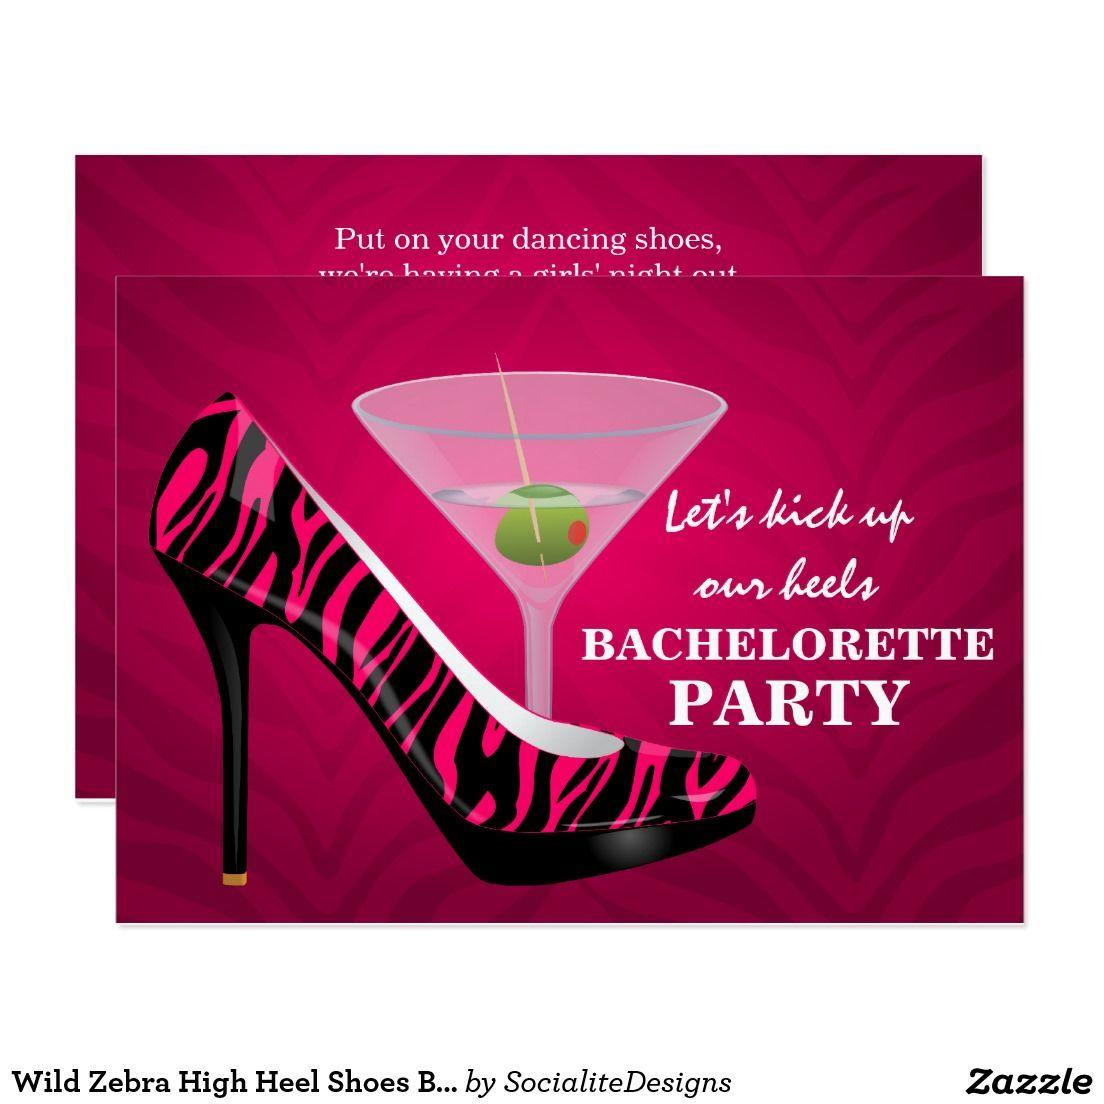 Wild Zebra High Heel Shoes Bachelorette Party Invitation | Pinterest ...